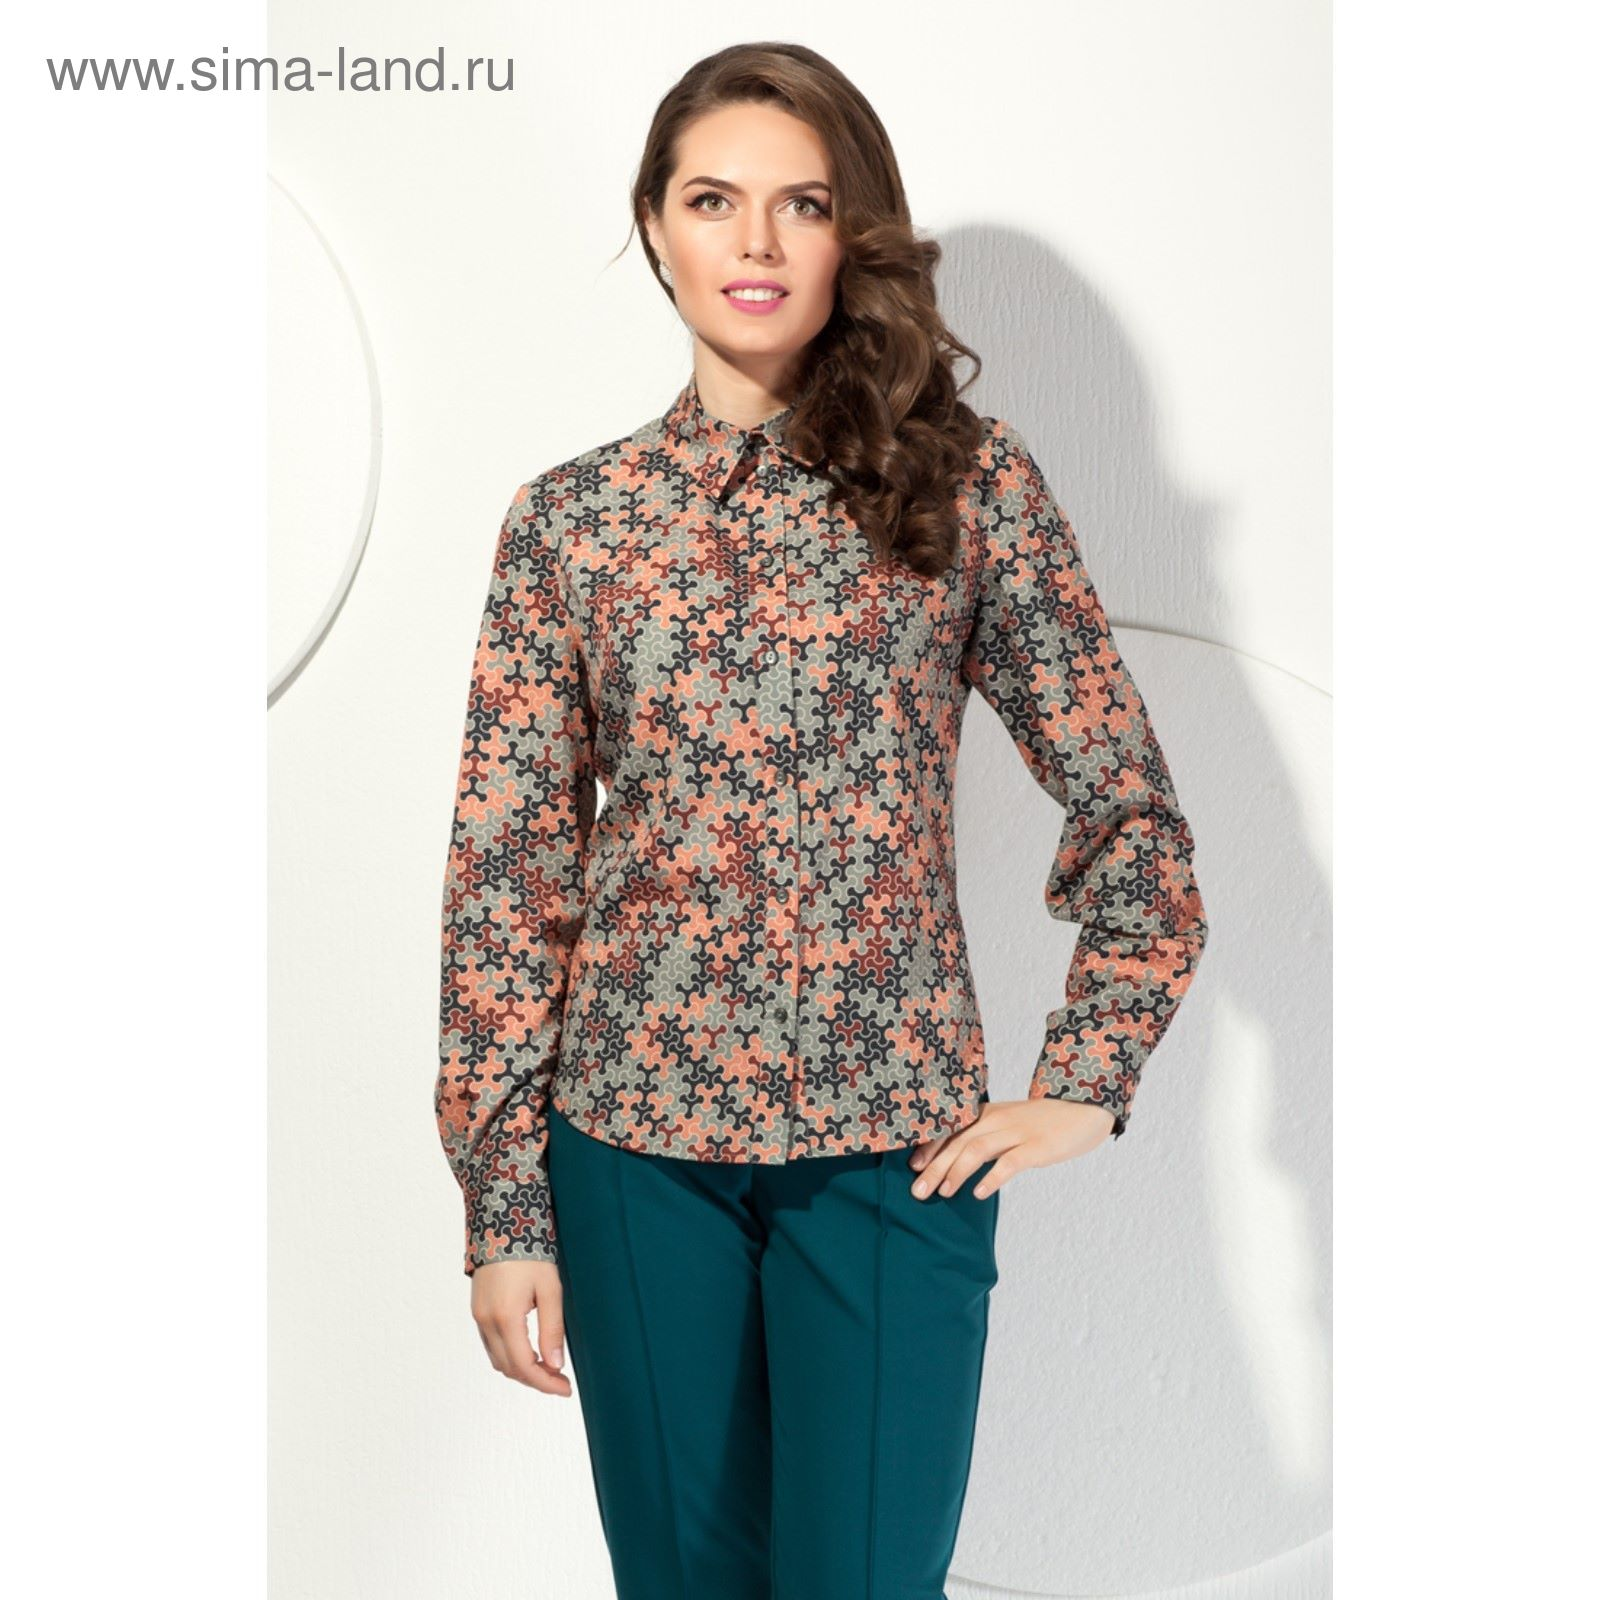 Блуза женская, размер 54, цвет зелёный+оранжевый Б-186 (2720440 ... 8ee12027dff